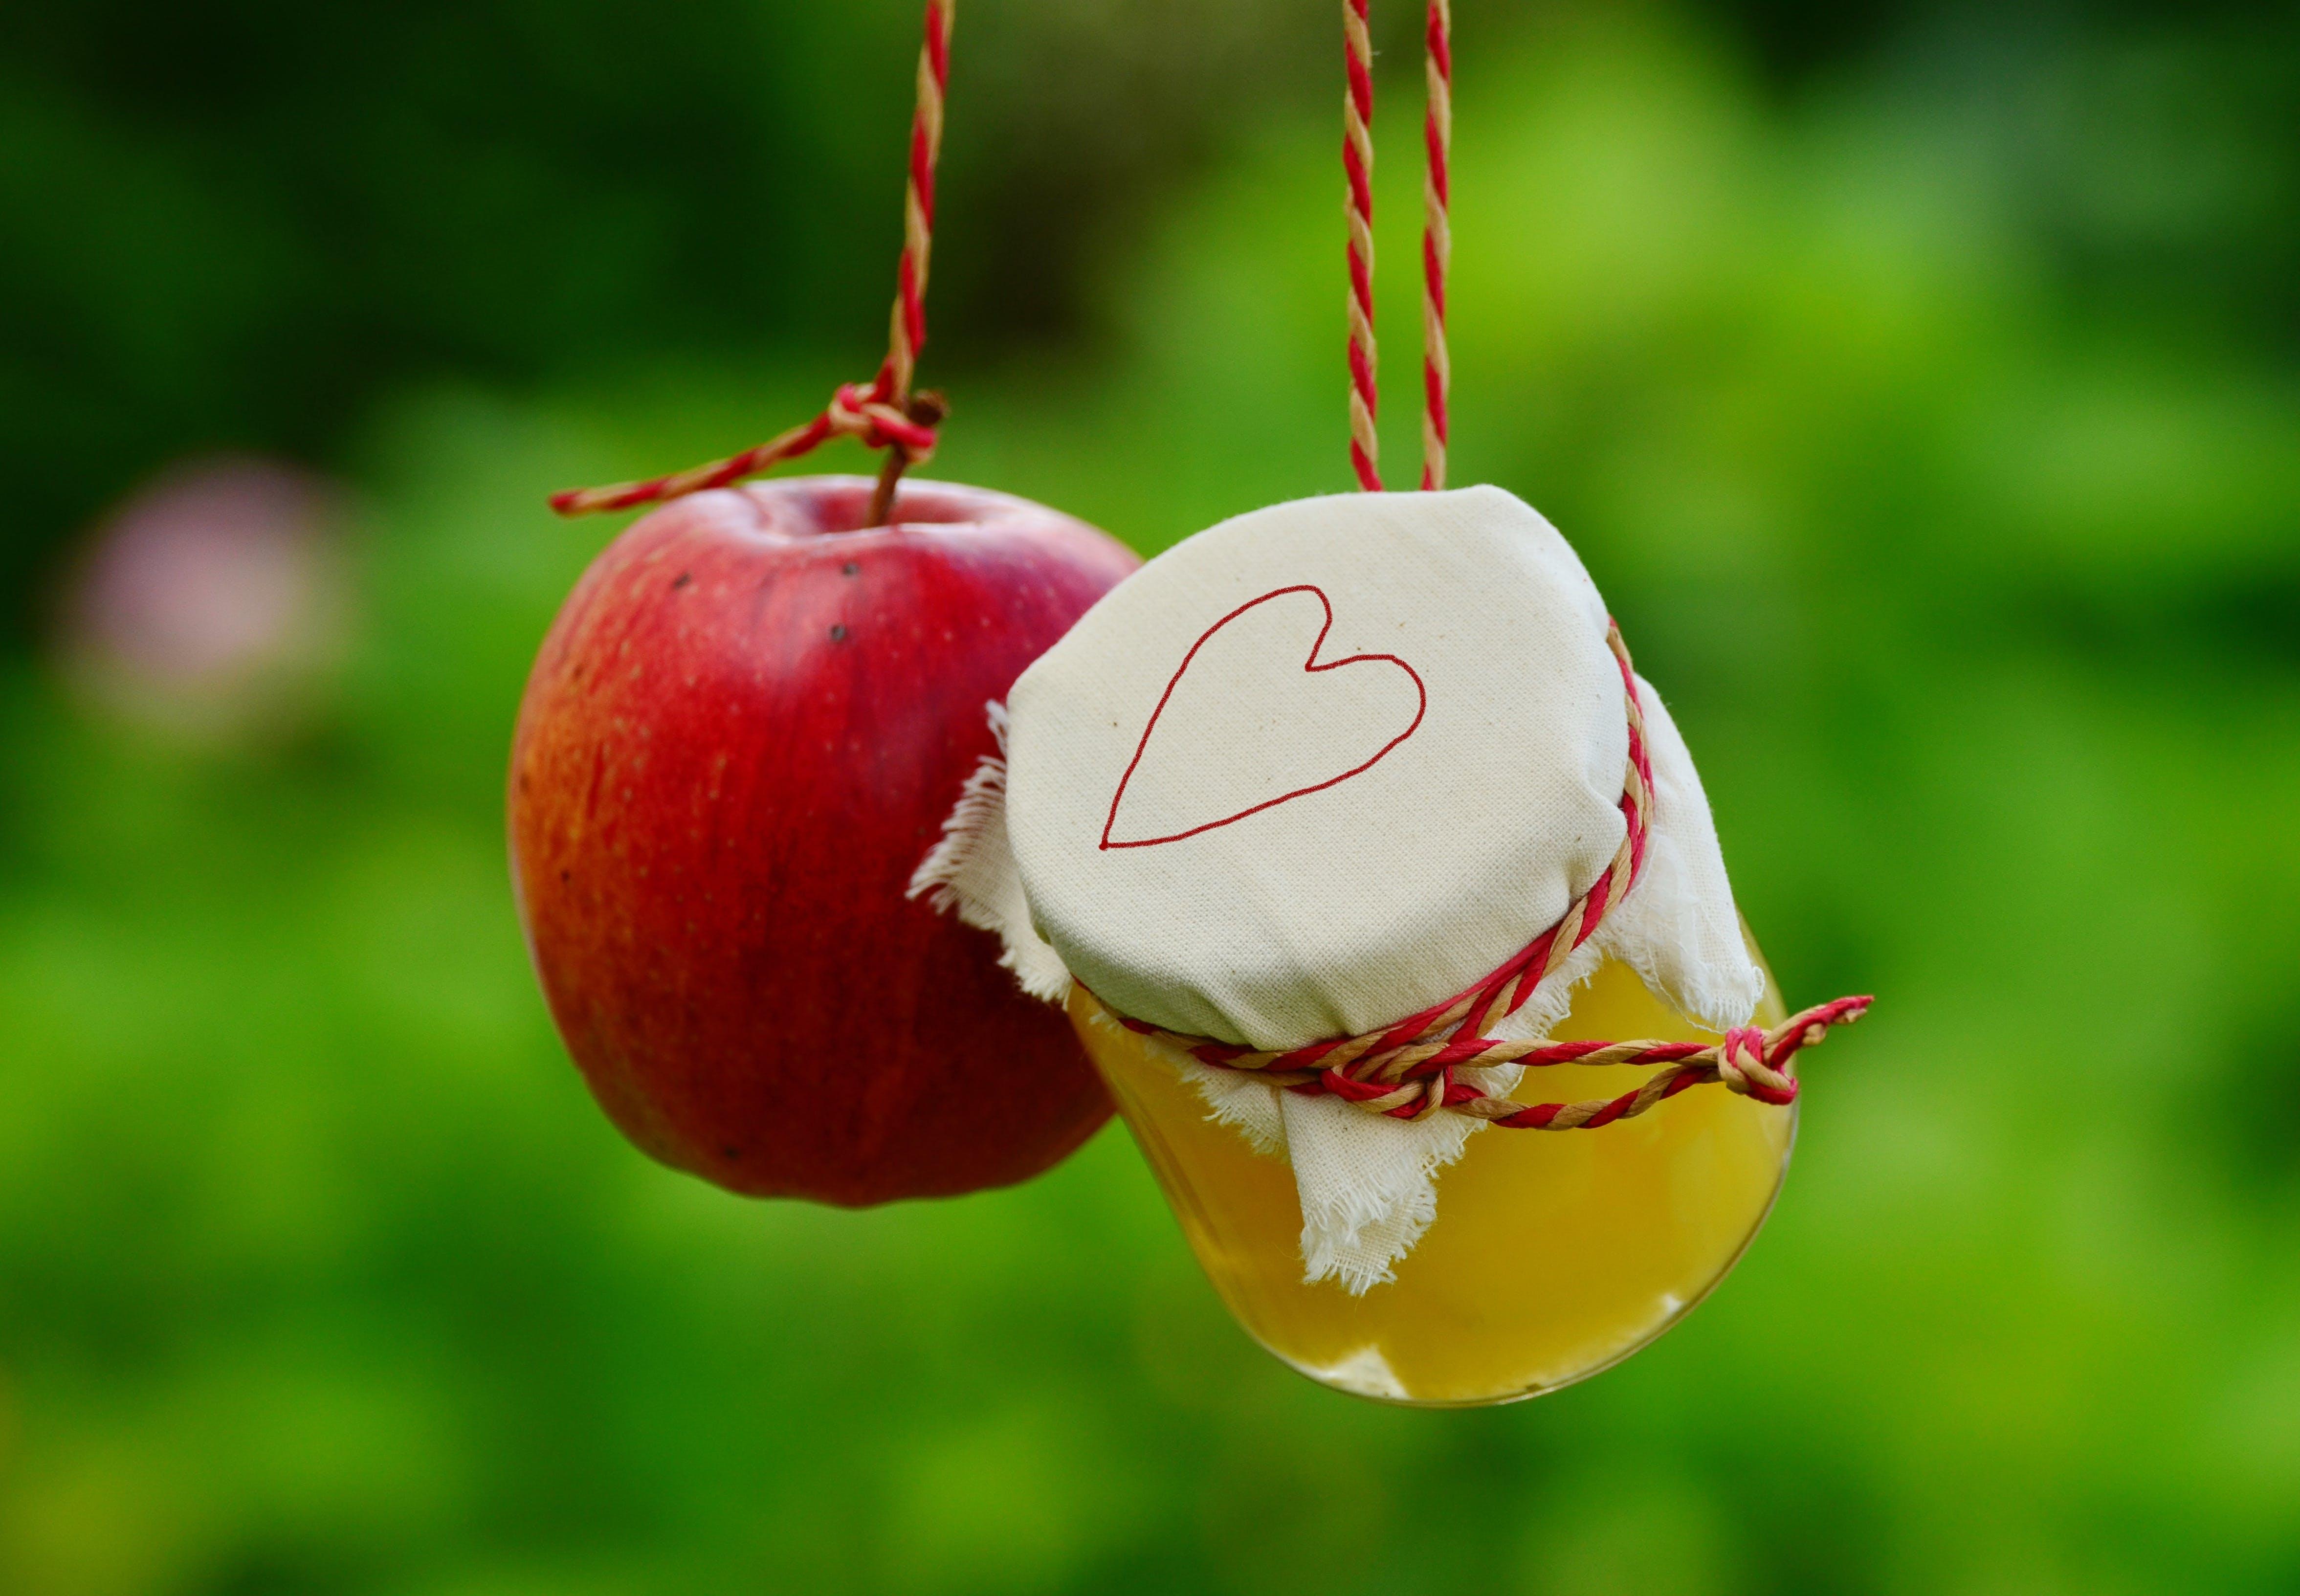 Red Apple Fruit Beside Clear Glass Jar